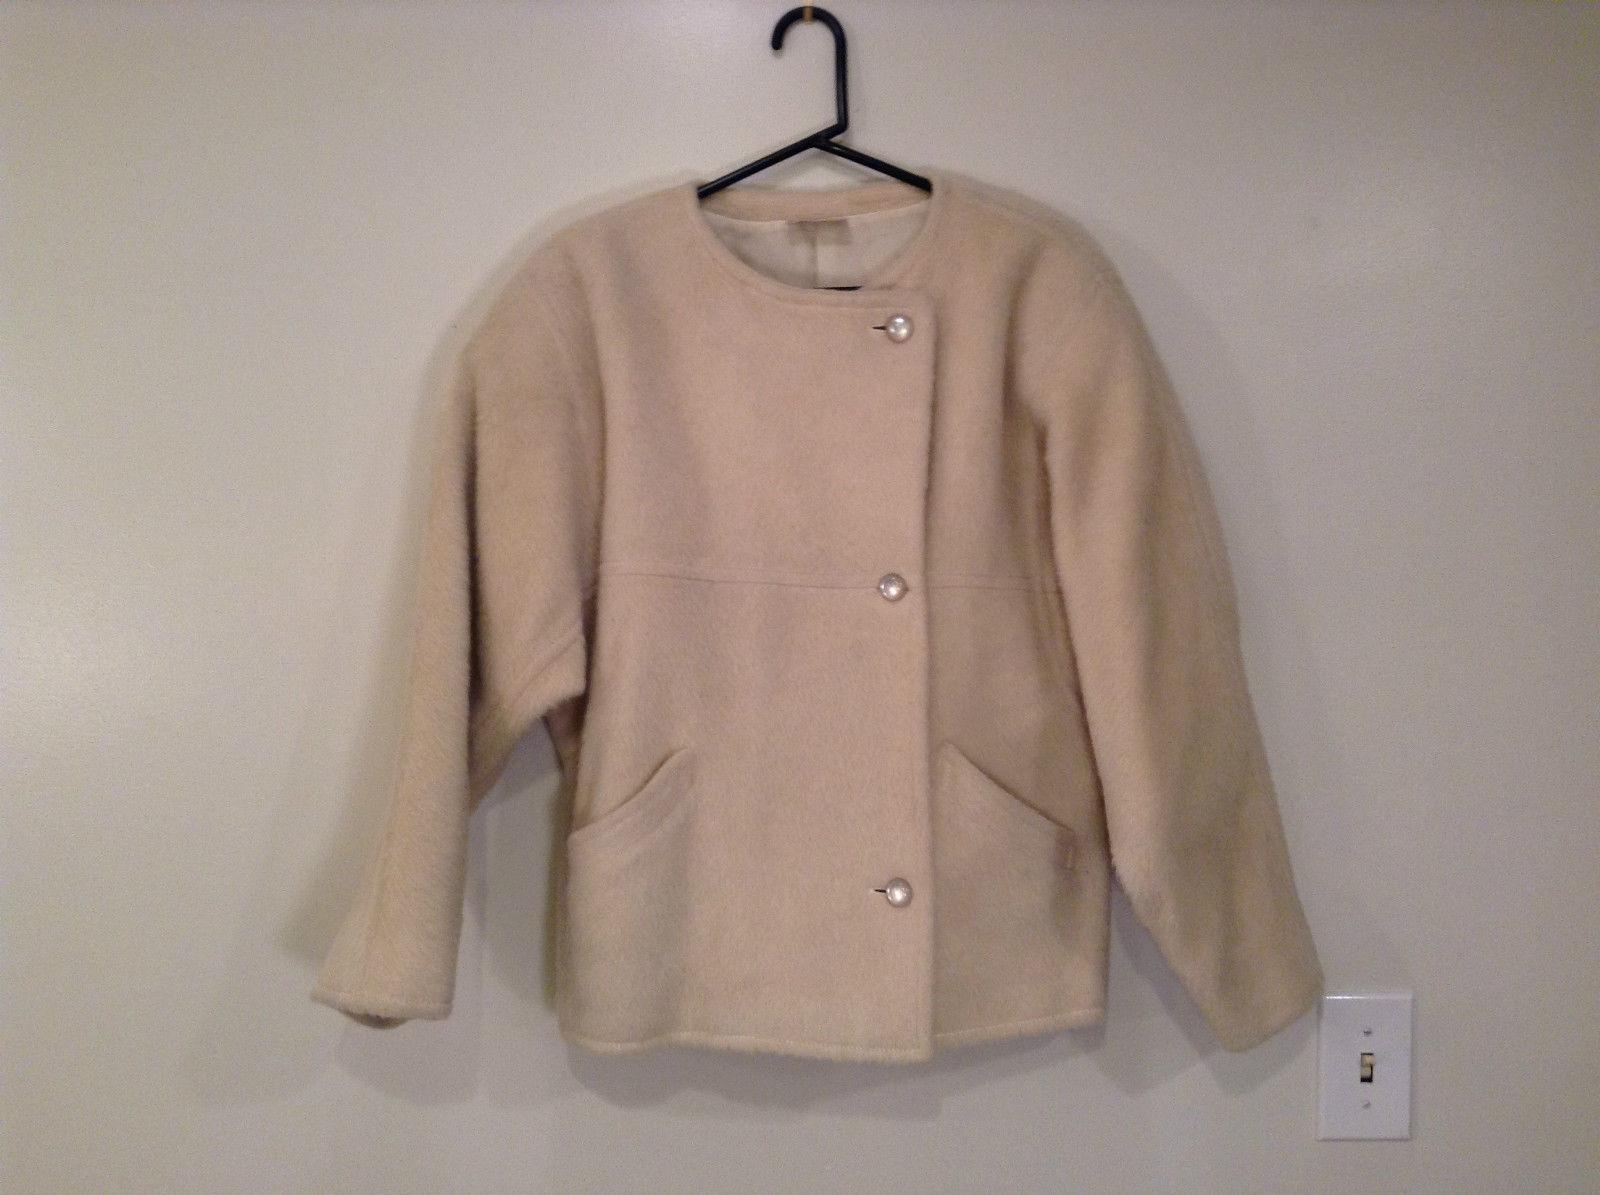 Portrait Vintage Style Lined Beige Jacket Laura Biagiotti size Large 42 Llama